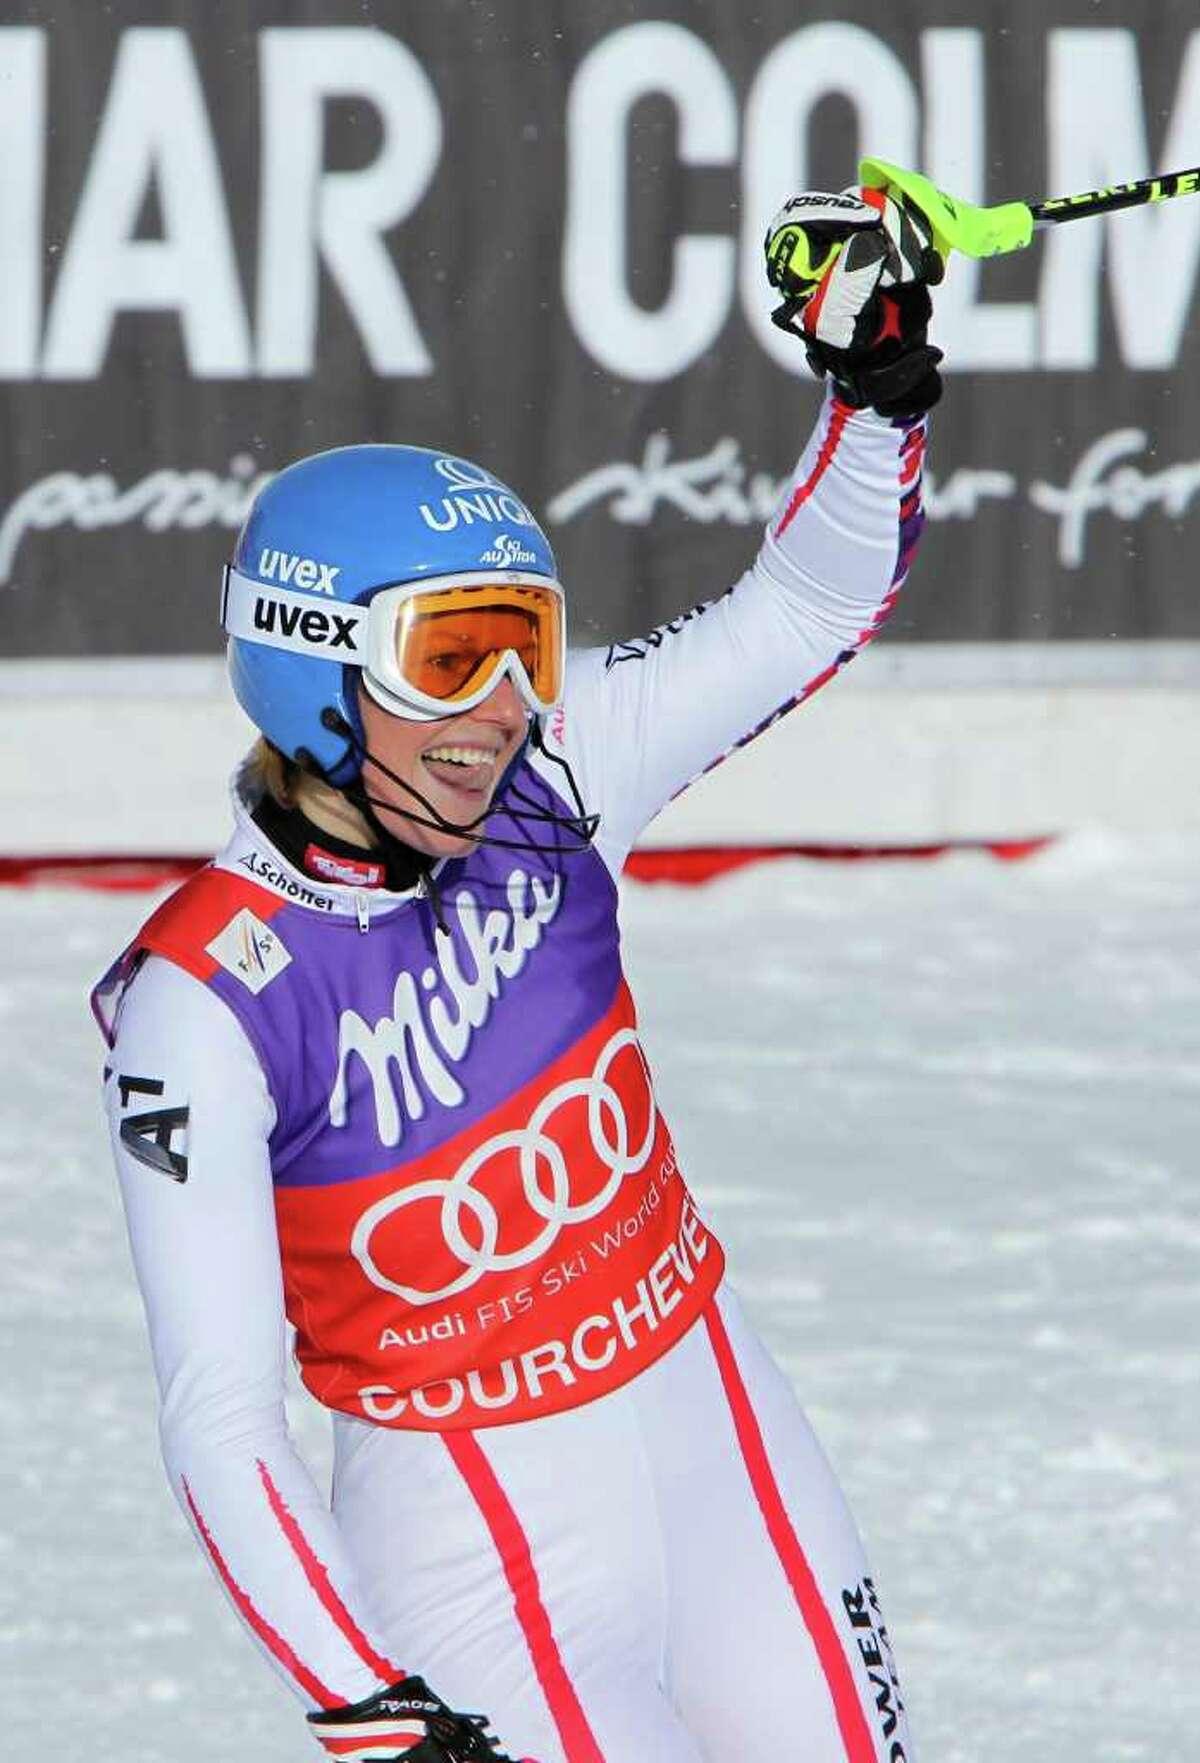 Austria's Marlies Schild celebrates after winning an alpine ski, women's World Cup slalom, in Courchevel, France, Sunday, Dec. 18, 2011. (AP Photo/Marco Trovati)